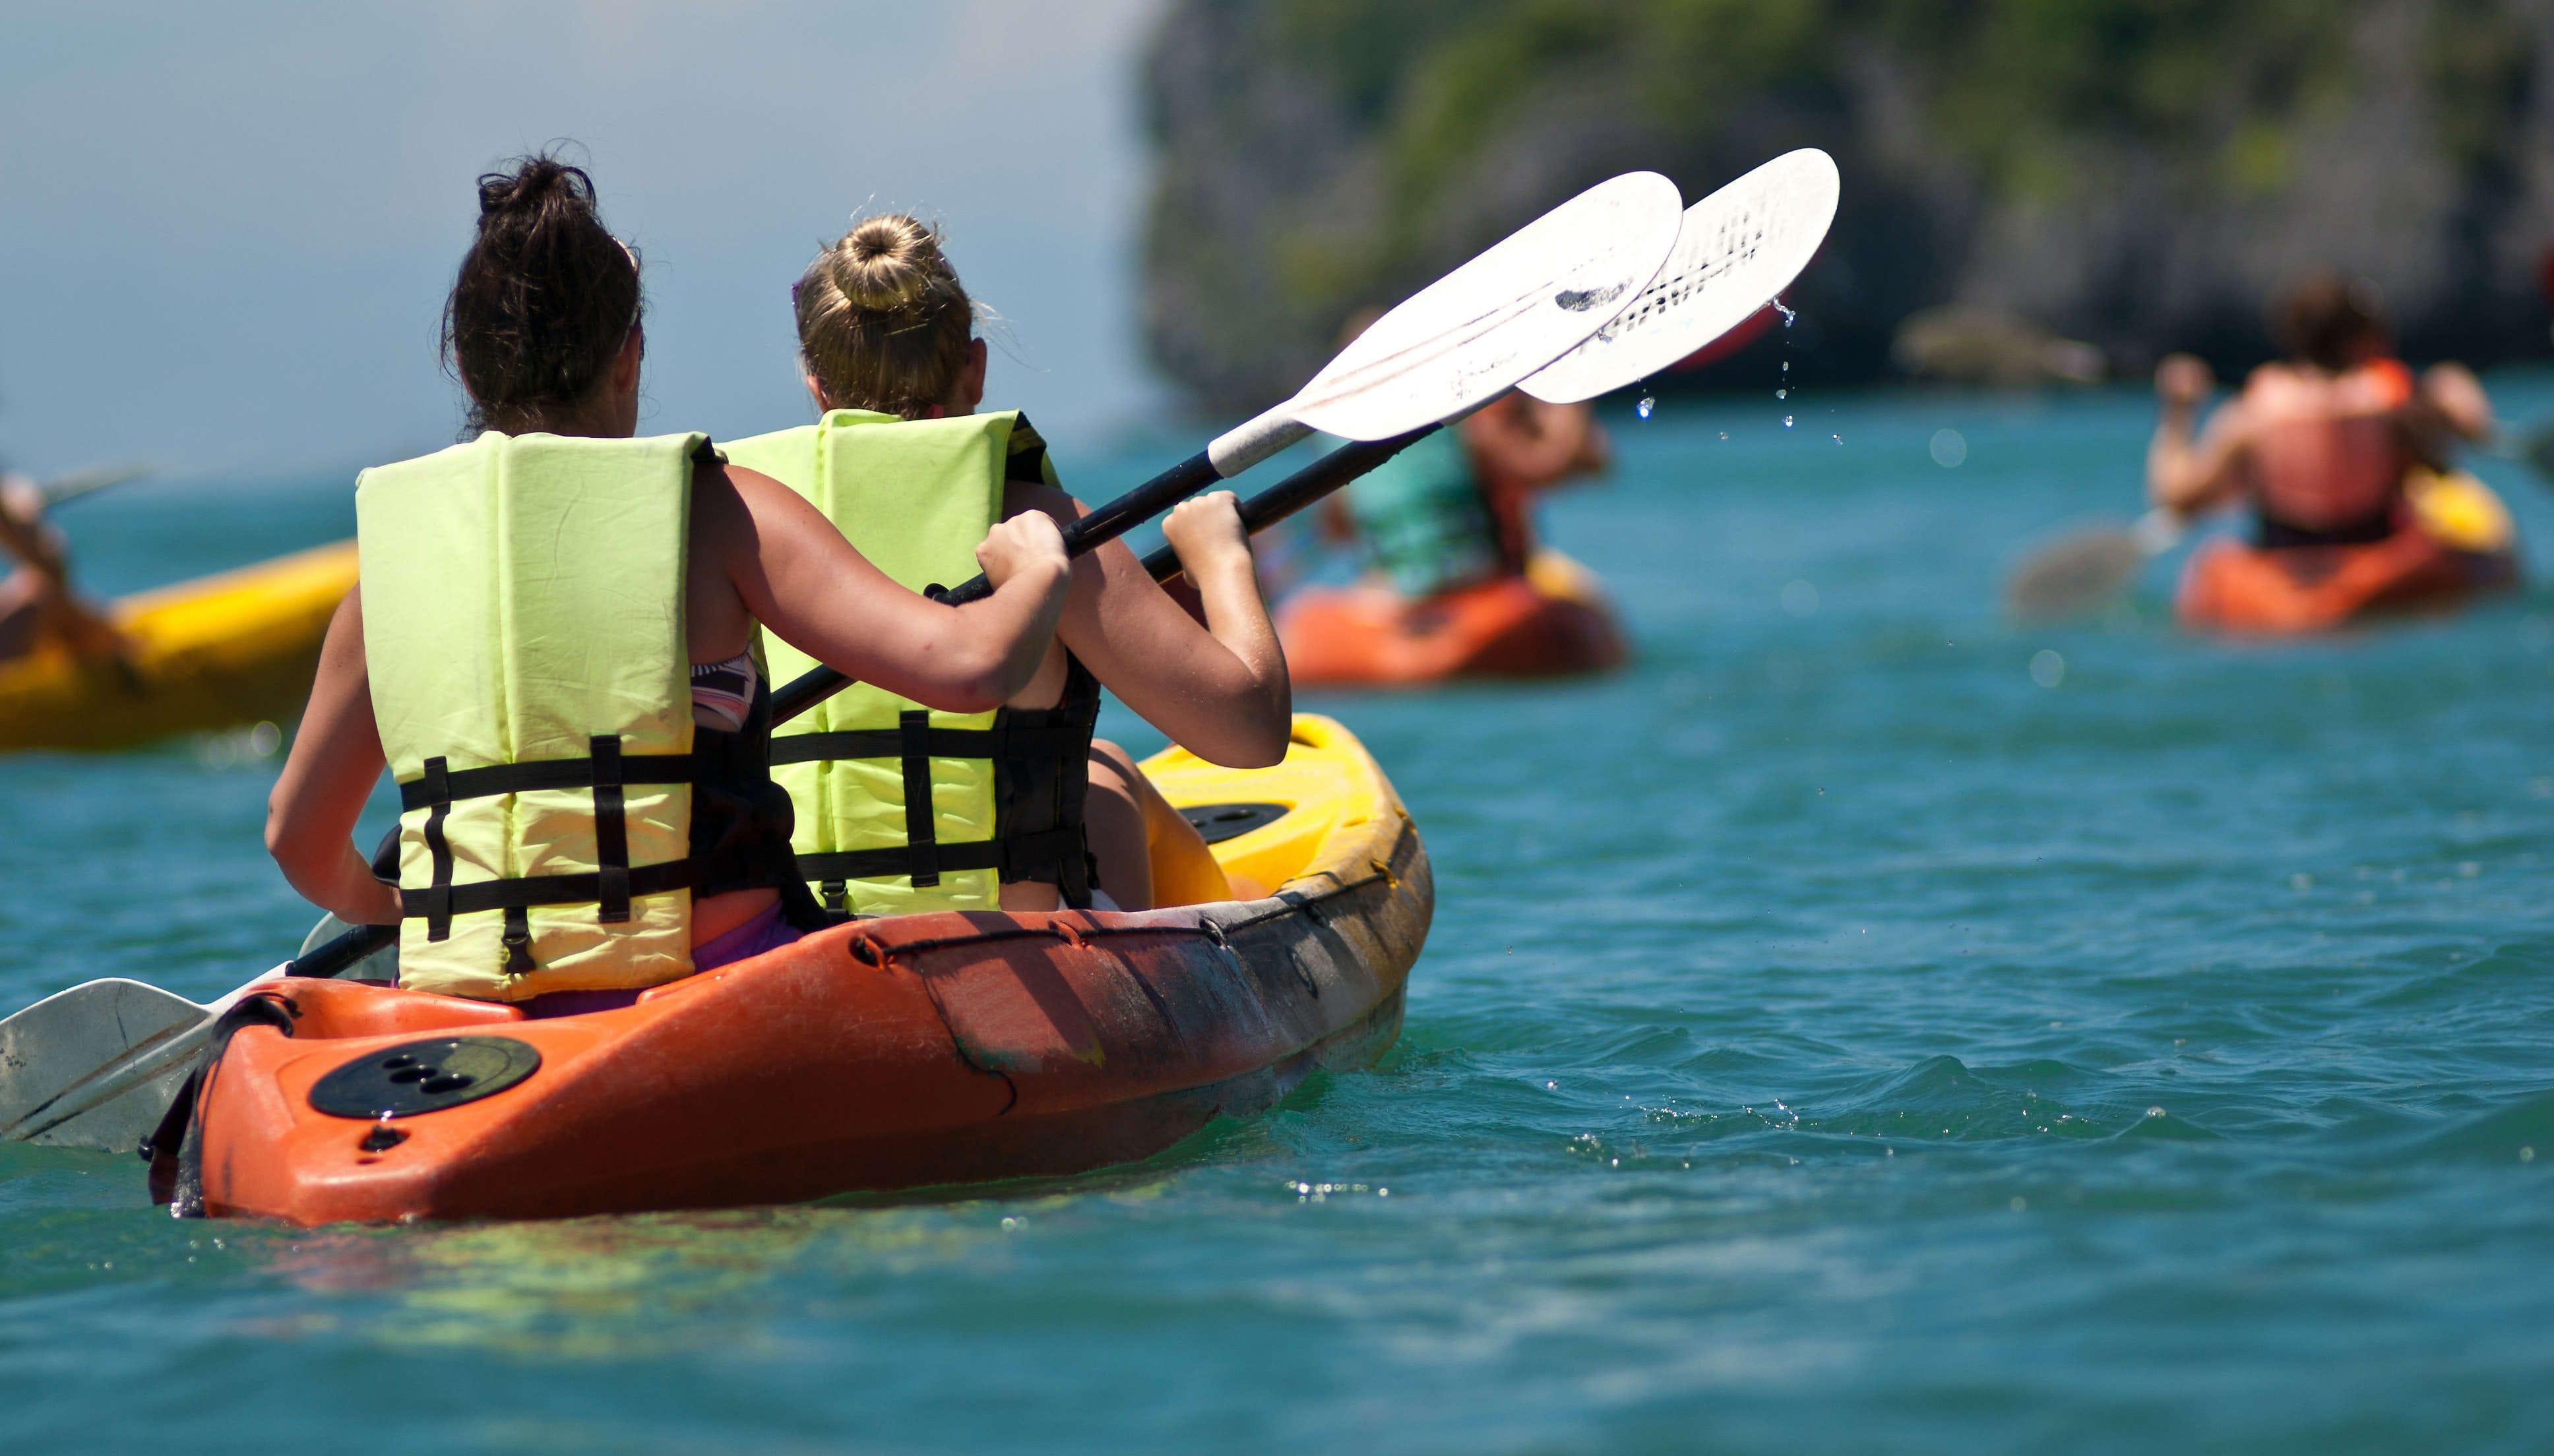 Sea kayaking copy-min